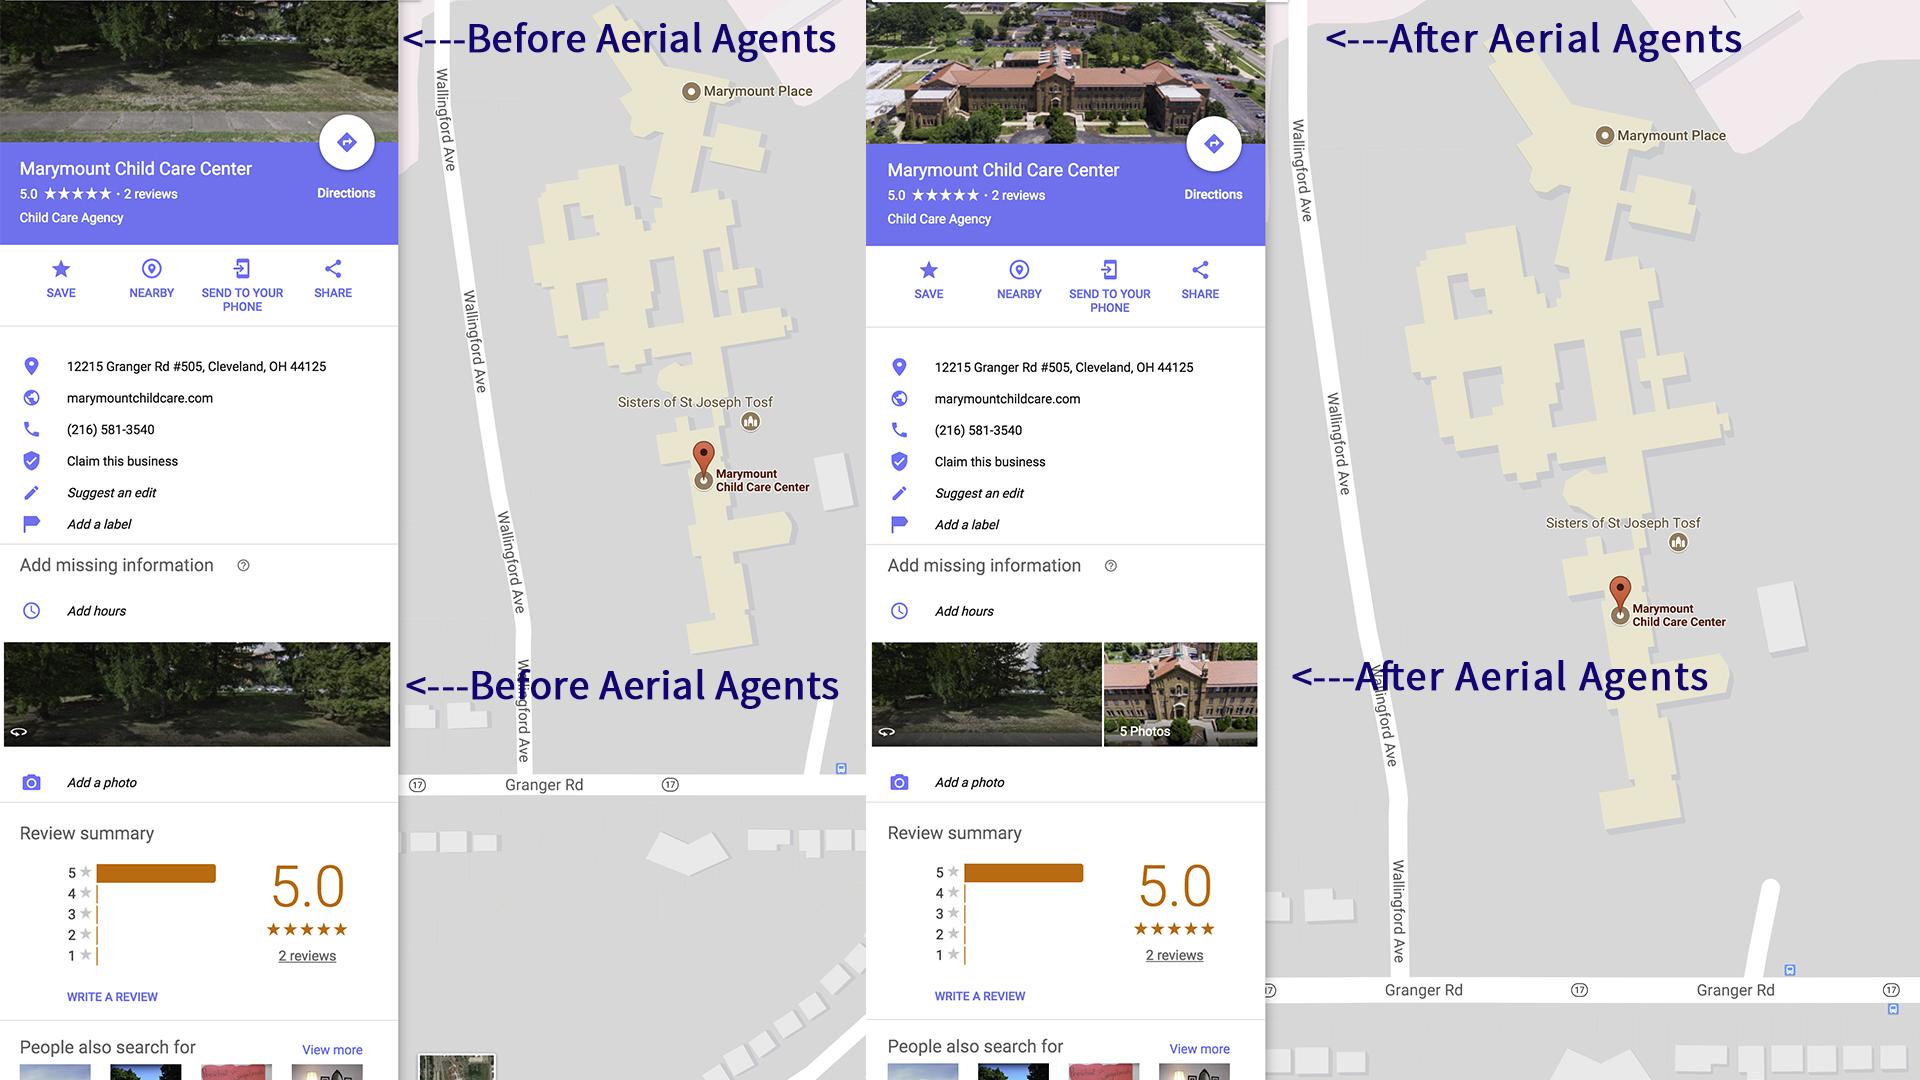 Google Maps Marymount_AA.jpg